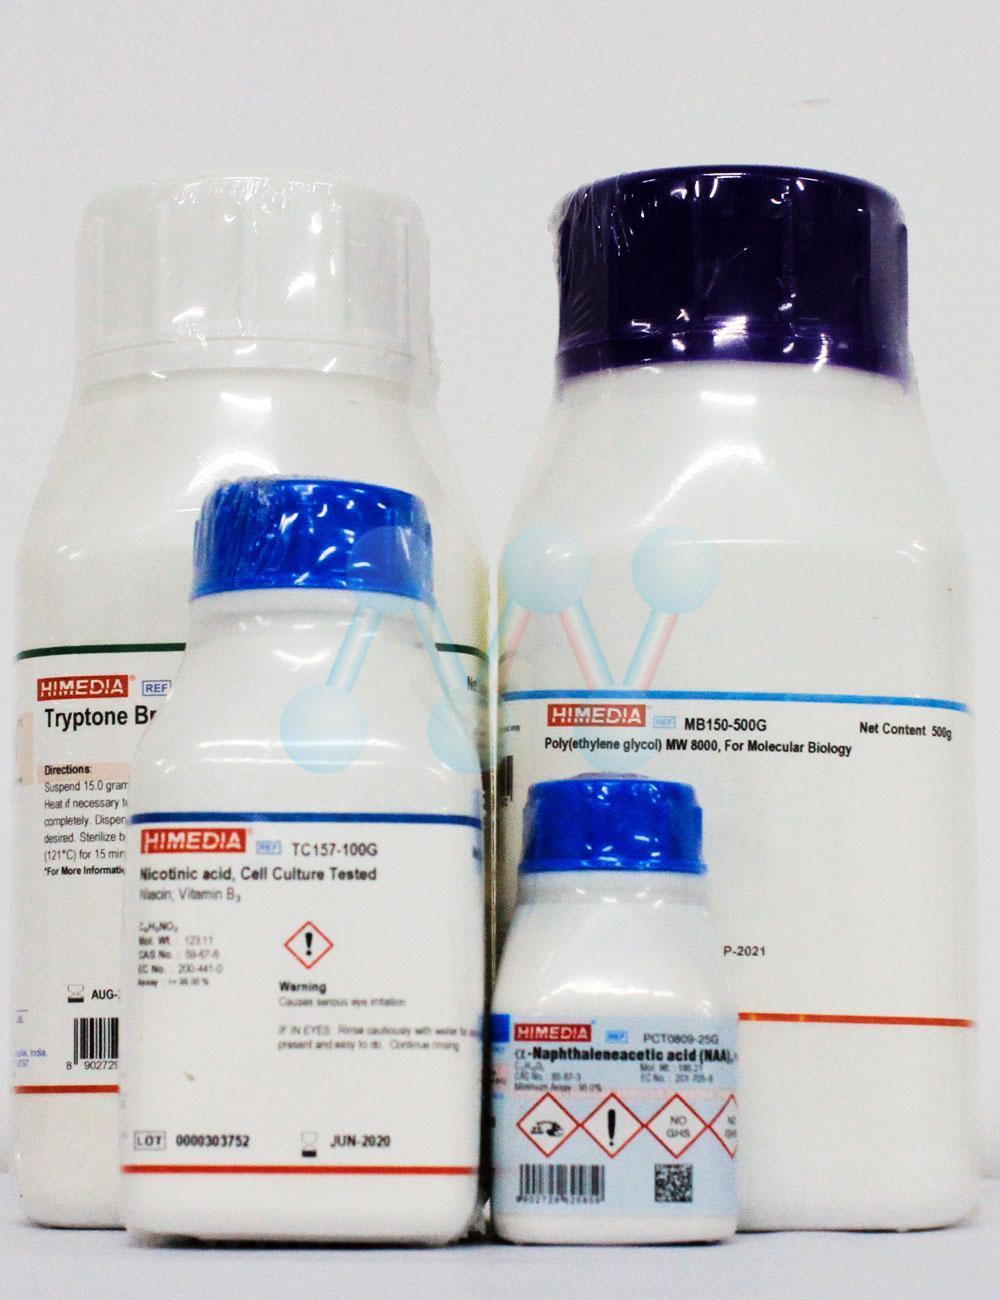 PolyvinylPyrrolidone (PVP) (C6H9NO)n